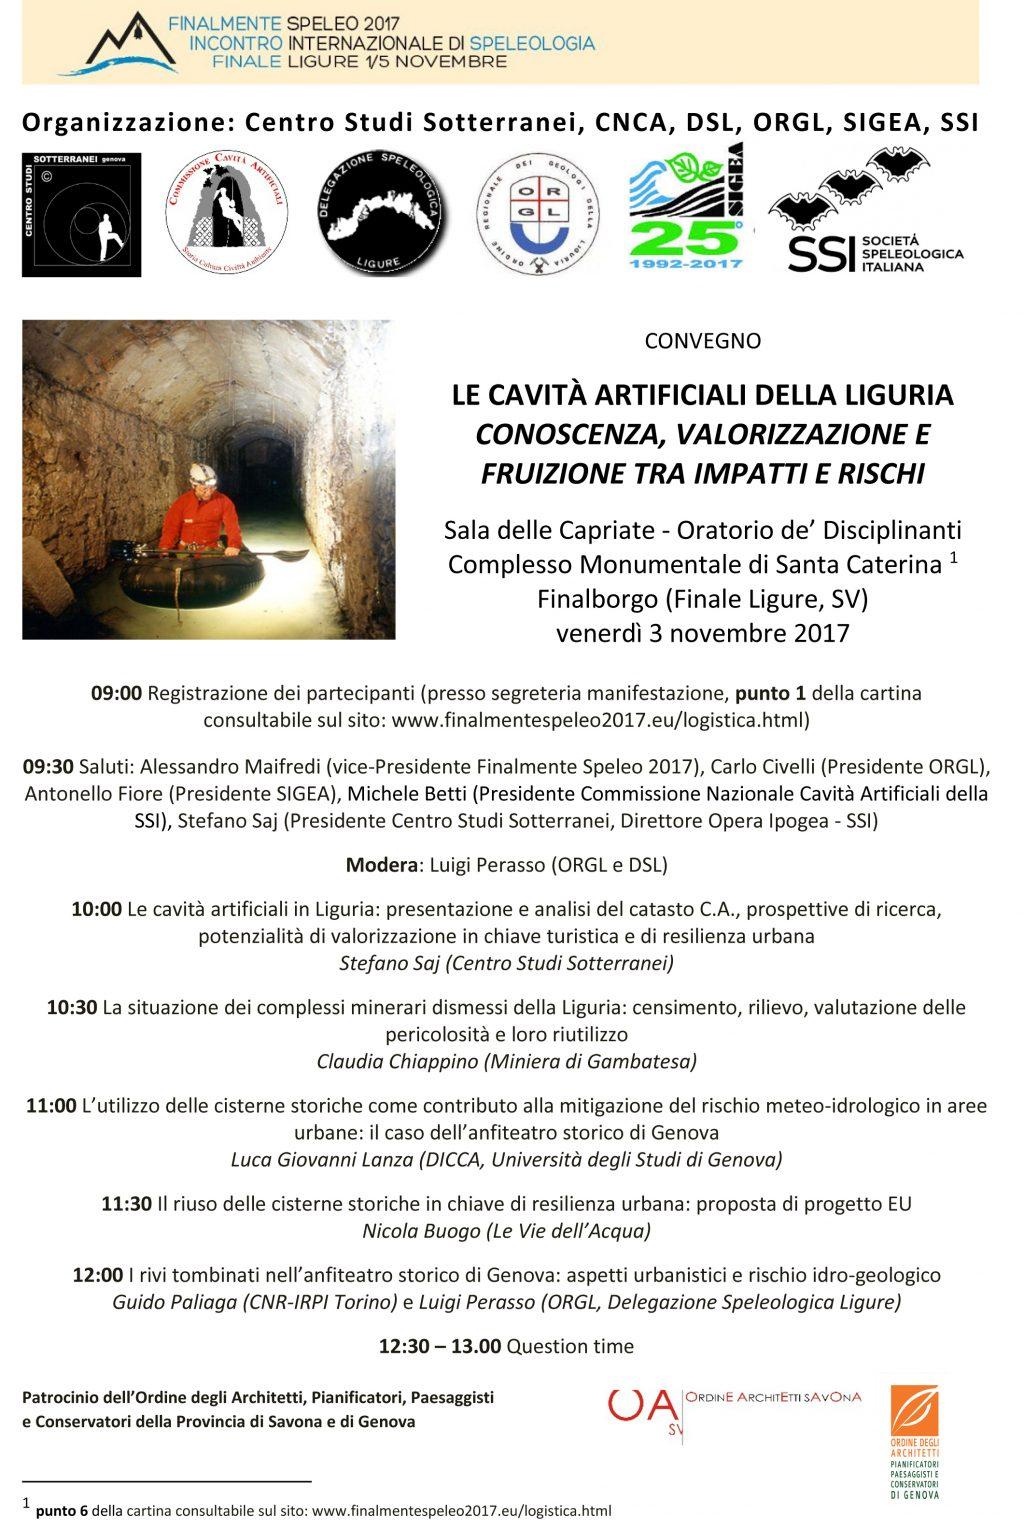 Locandina Convegno 3.11.2017